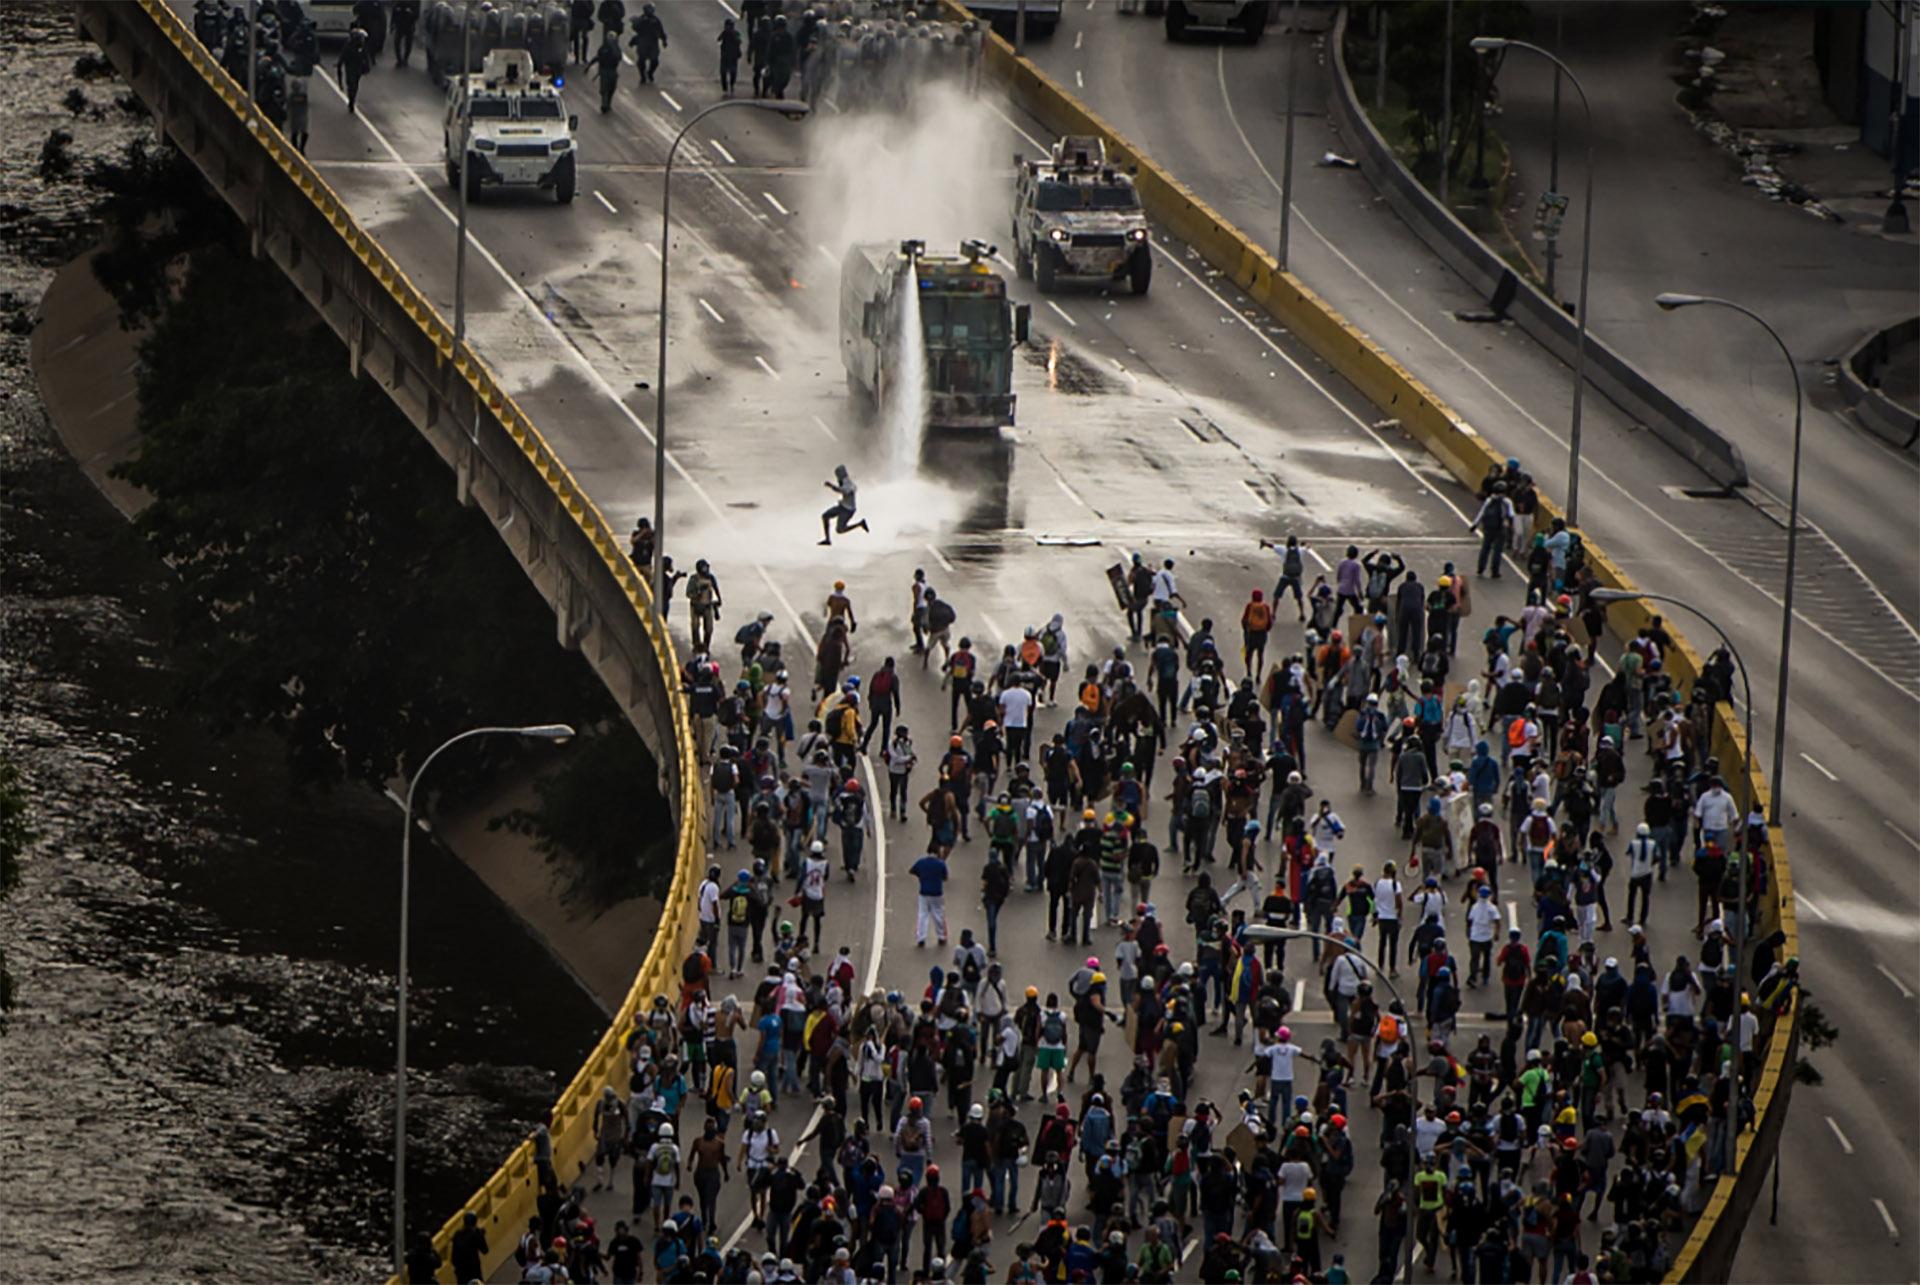 Represión en la autopista Francisco Fajardo (Meridith Kohut for The New York Times)